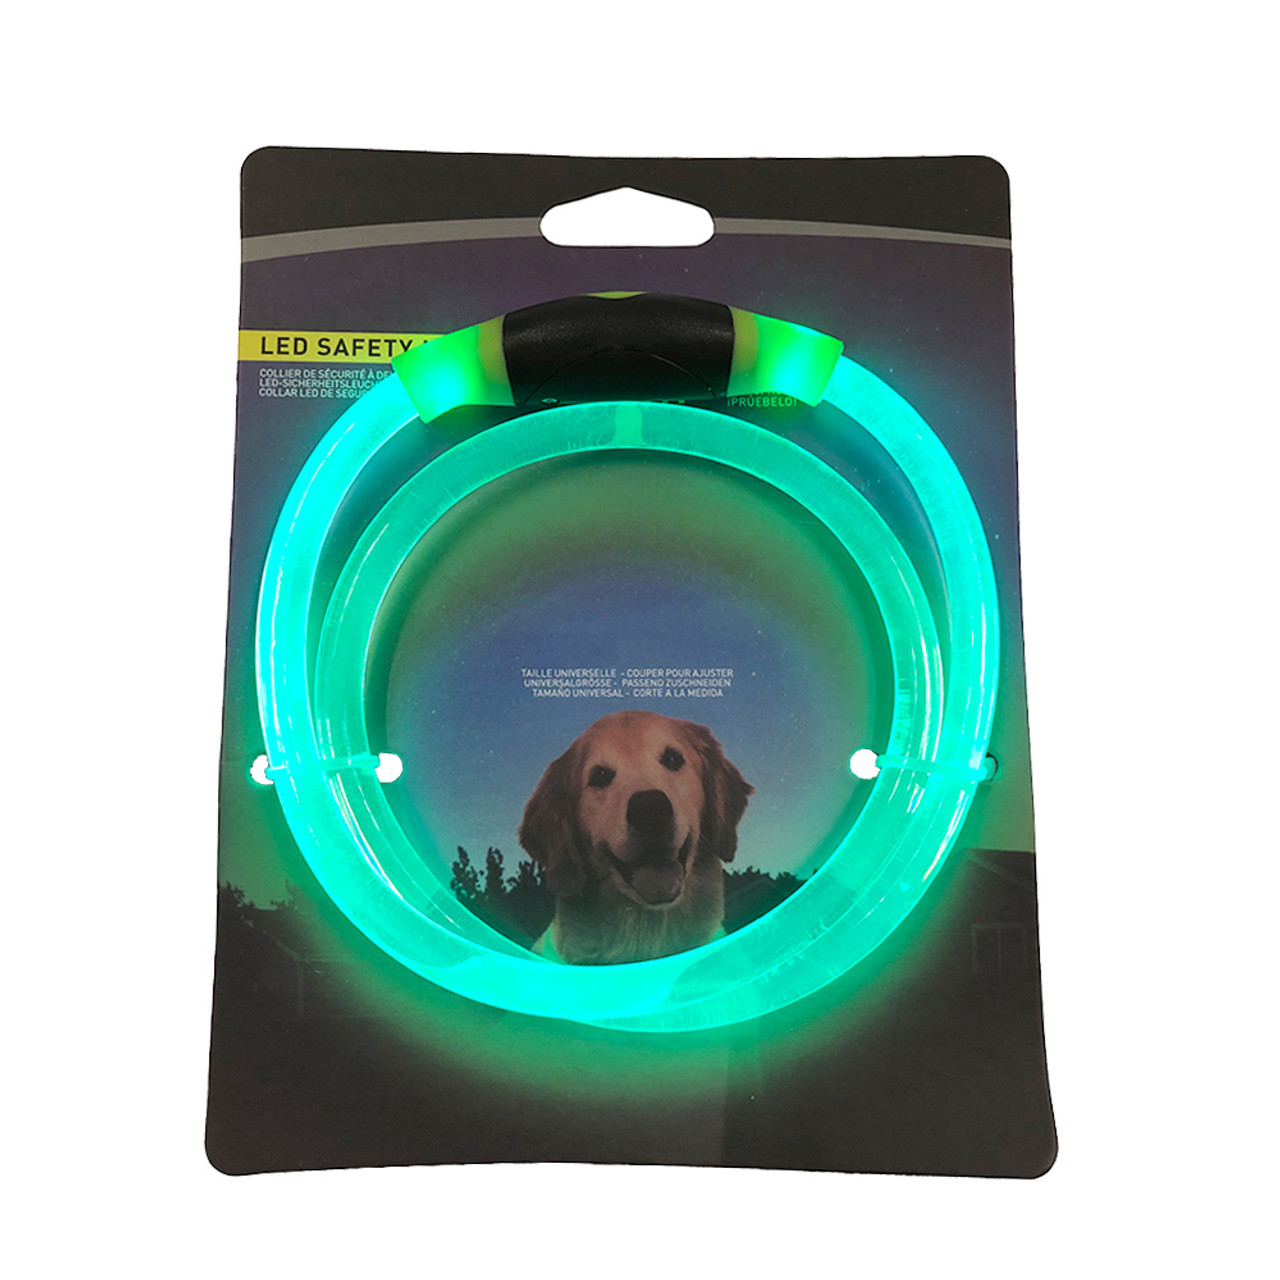 LED Safety Necklace Dog Collar